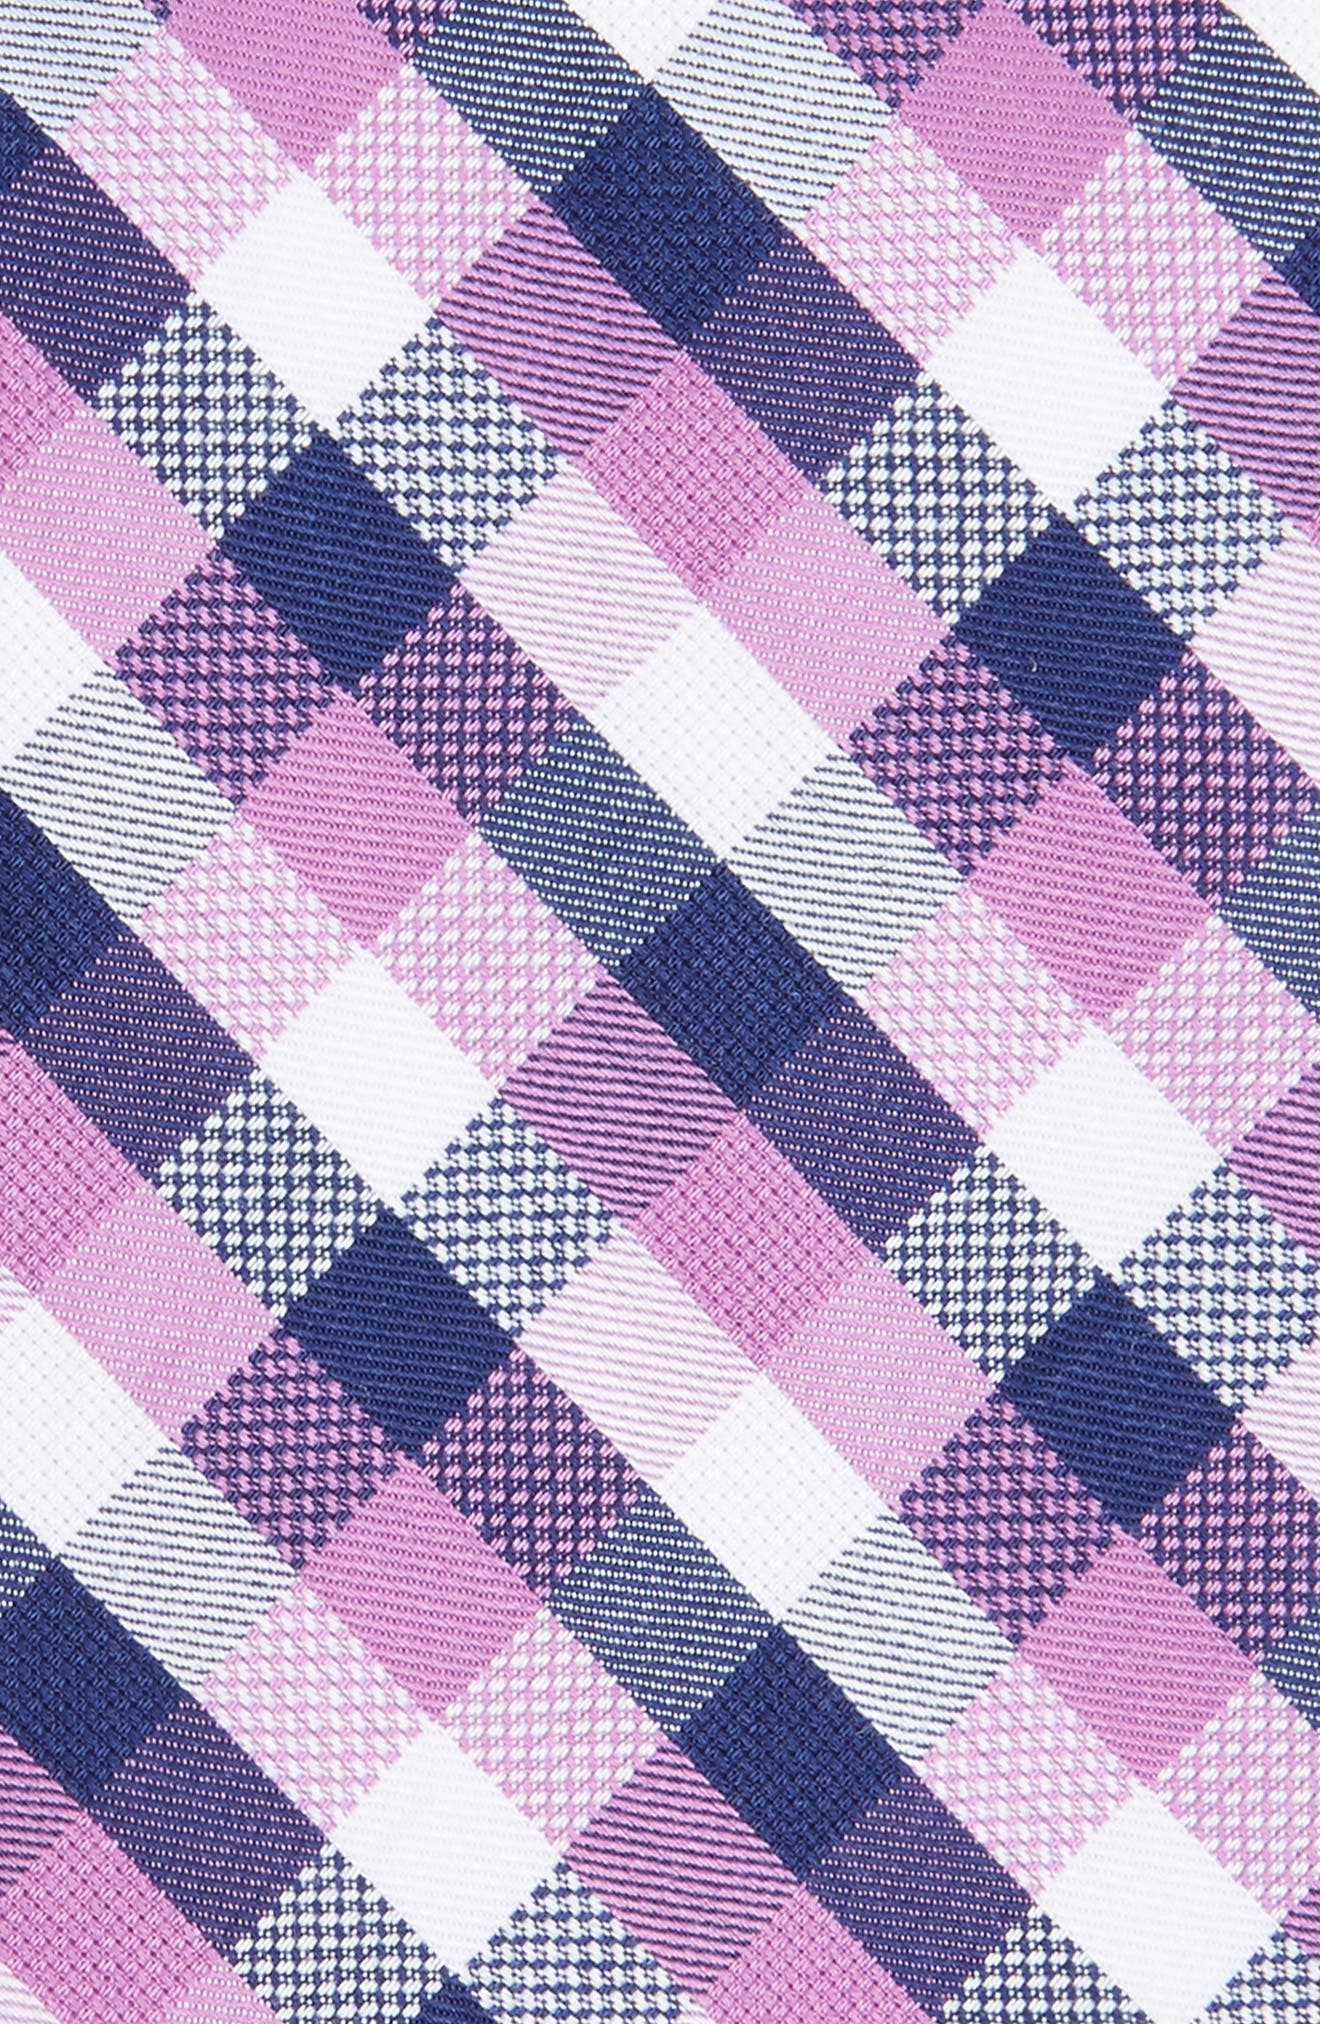 Scott Check Cotton Skinny Tie,                             Alternate thumbnail 10, color,